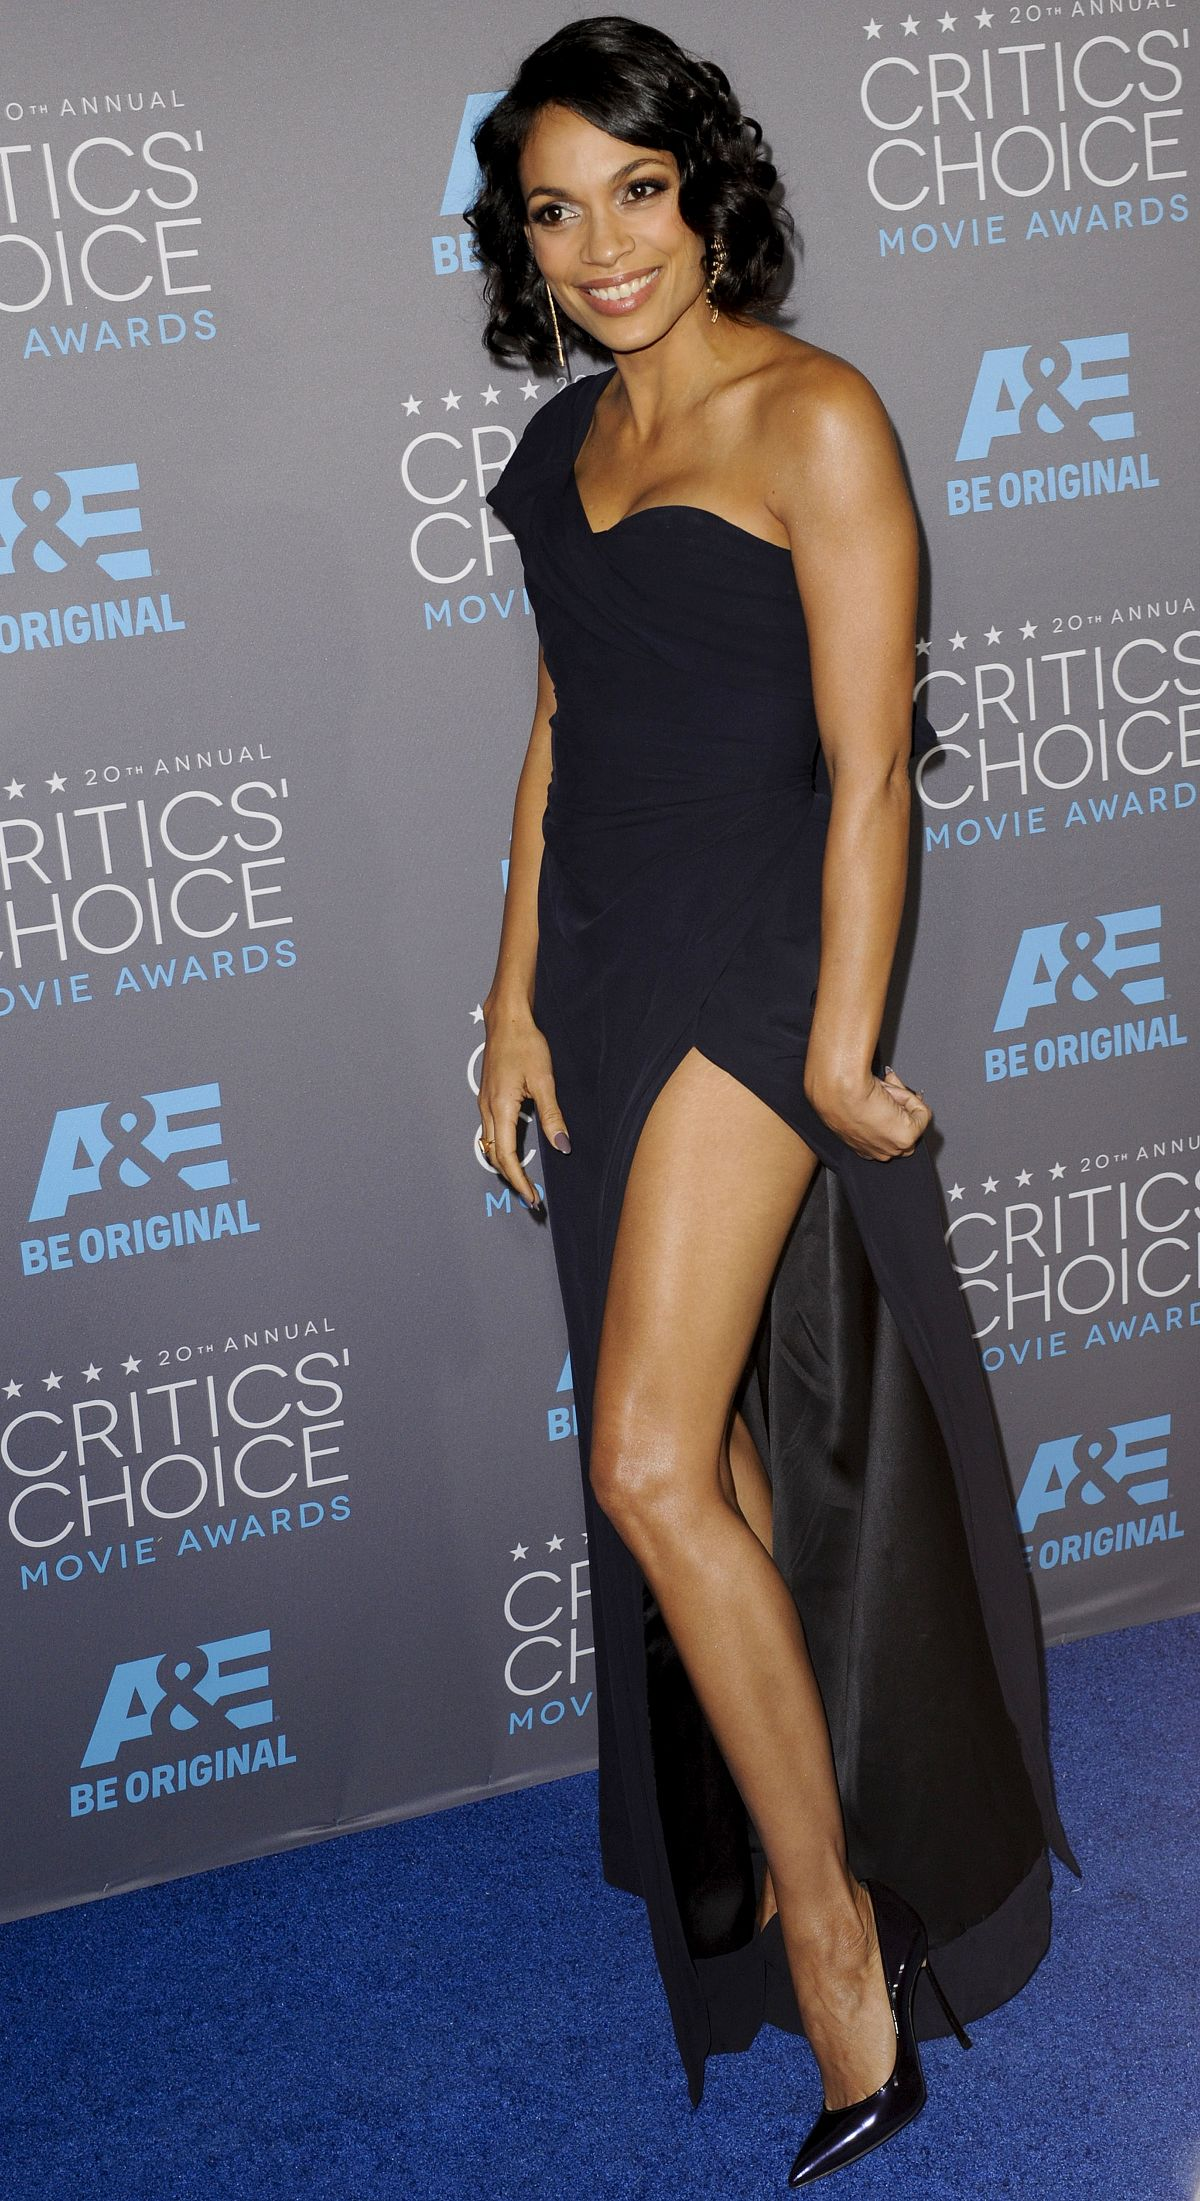 ROSARIO DAWSON At 2015 Critics Choice Movie Awards In Los Angeles HawtCelebs